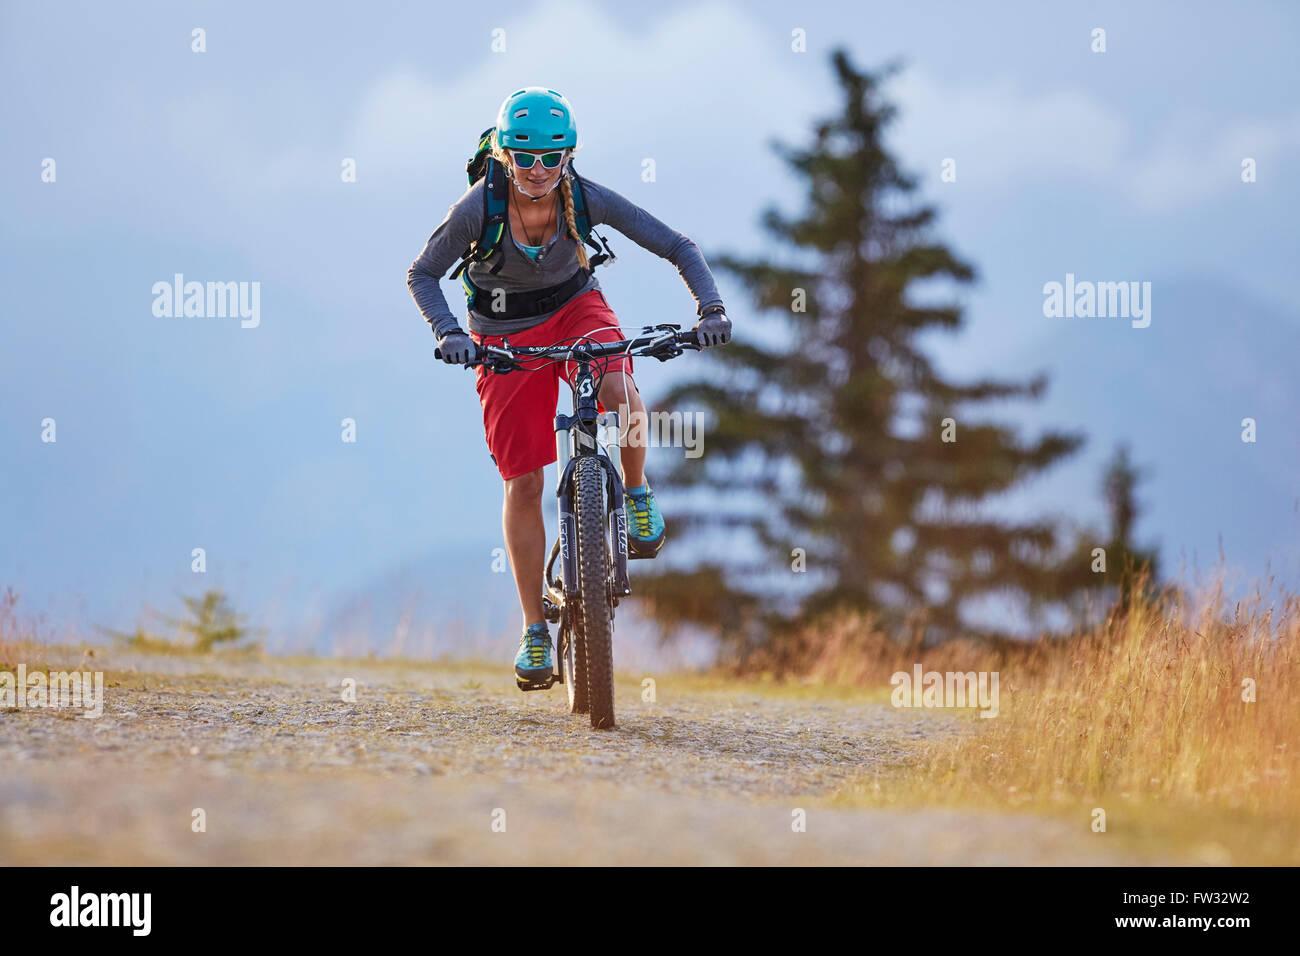 Mountain biker with a helmet riding on a gravel road, Mutterer Alm near Innsbruck, Tyrol, Austria Stock Photo